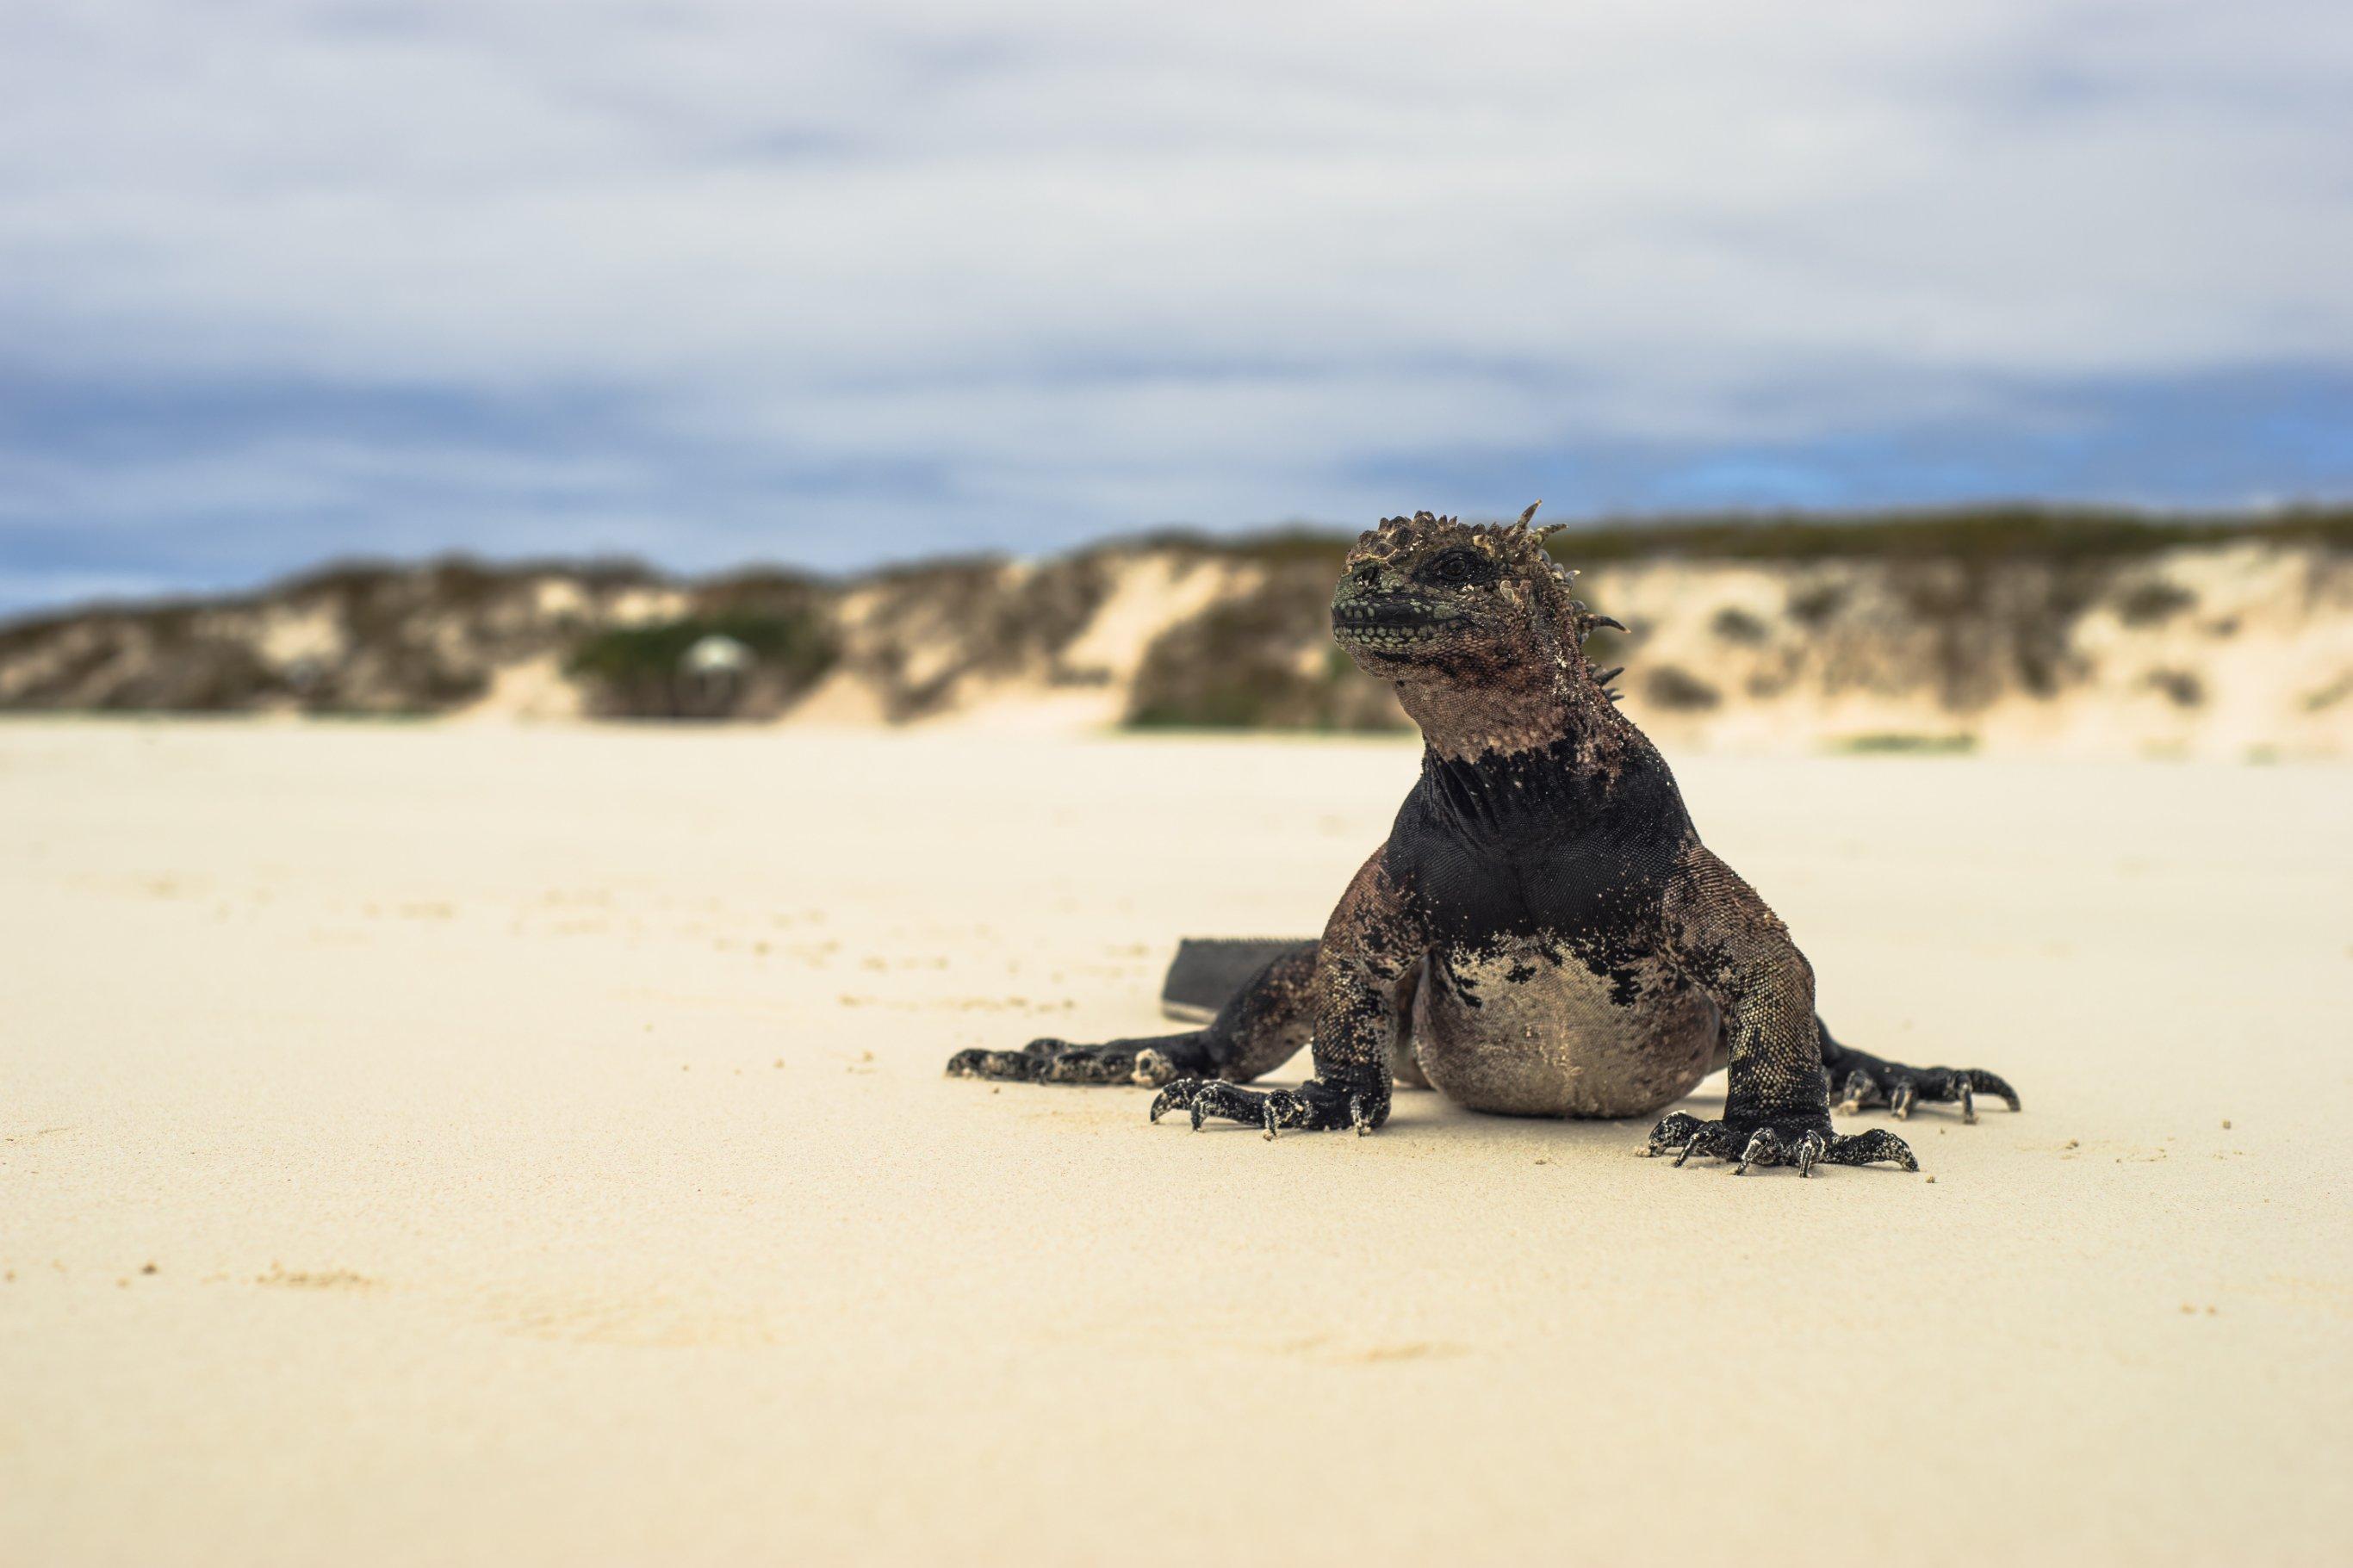 5-Day Galapagos Cruise Northern Islands - Ecuador Itinerary